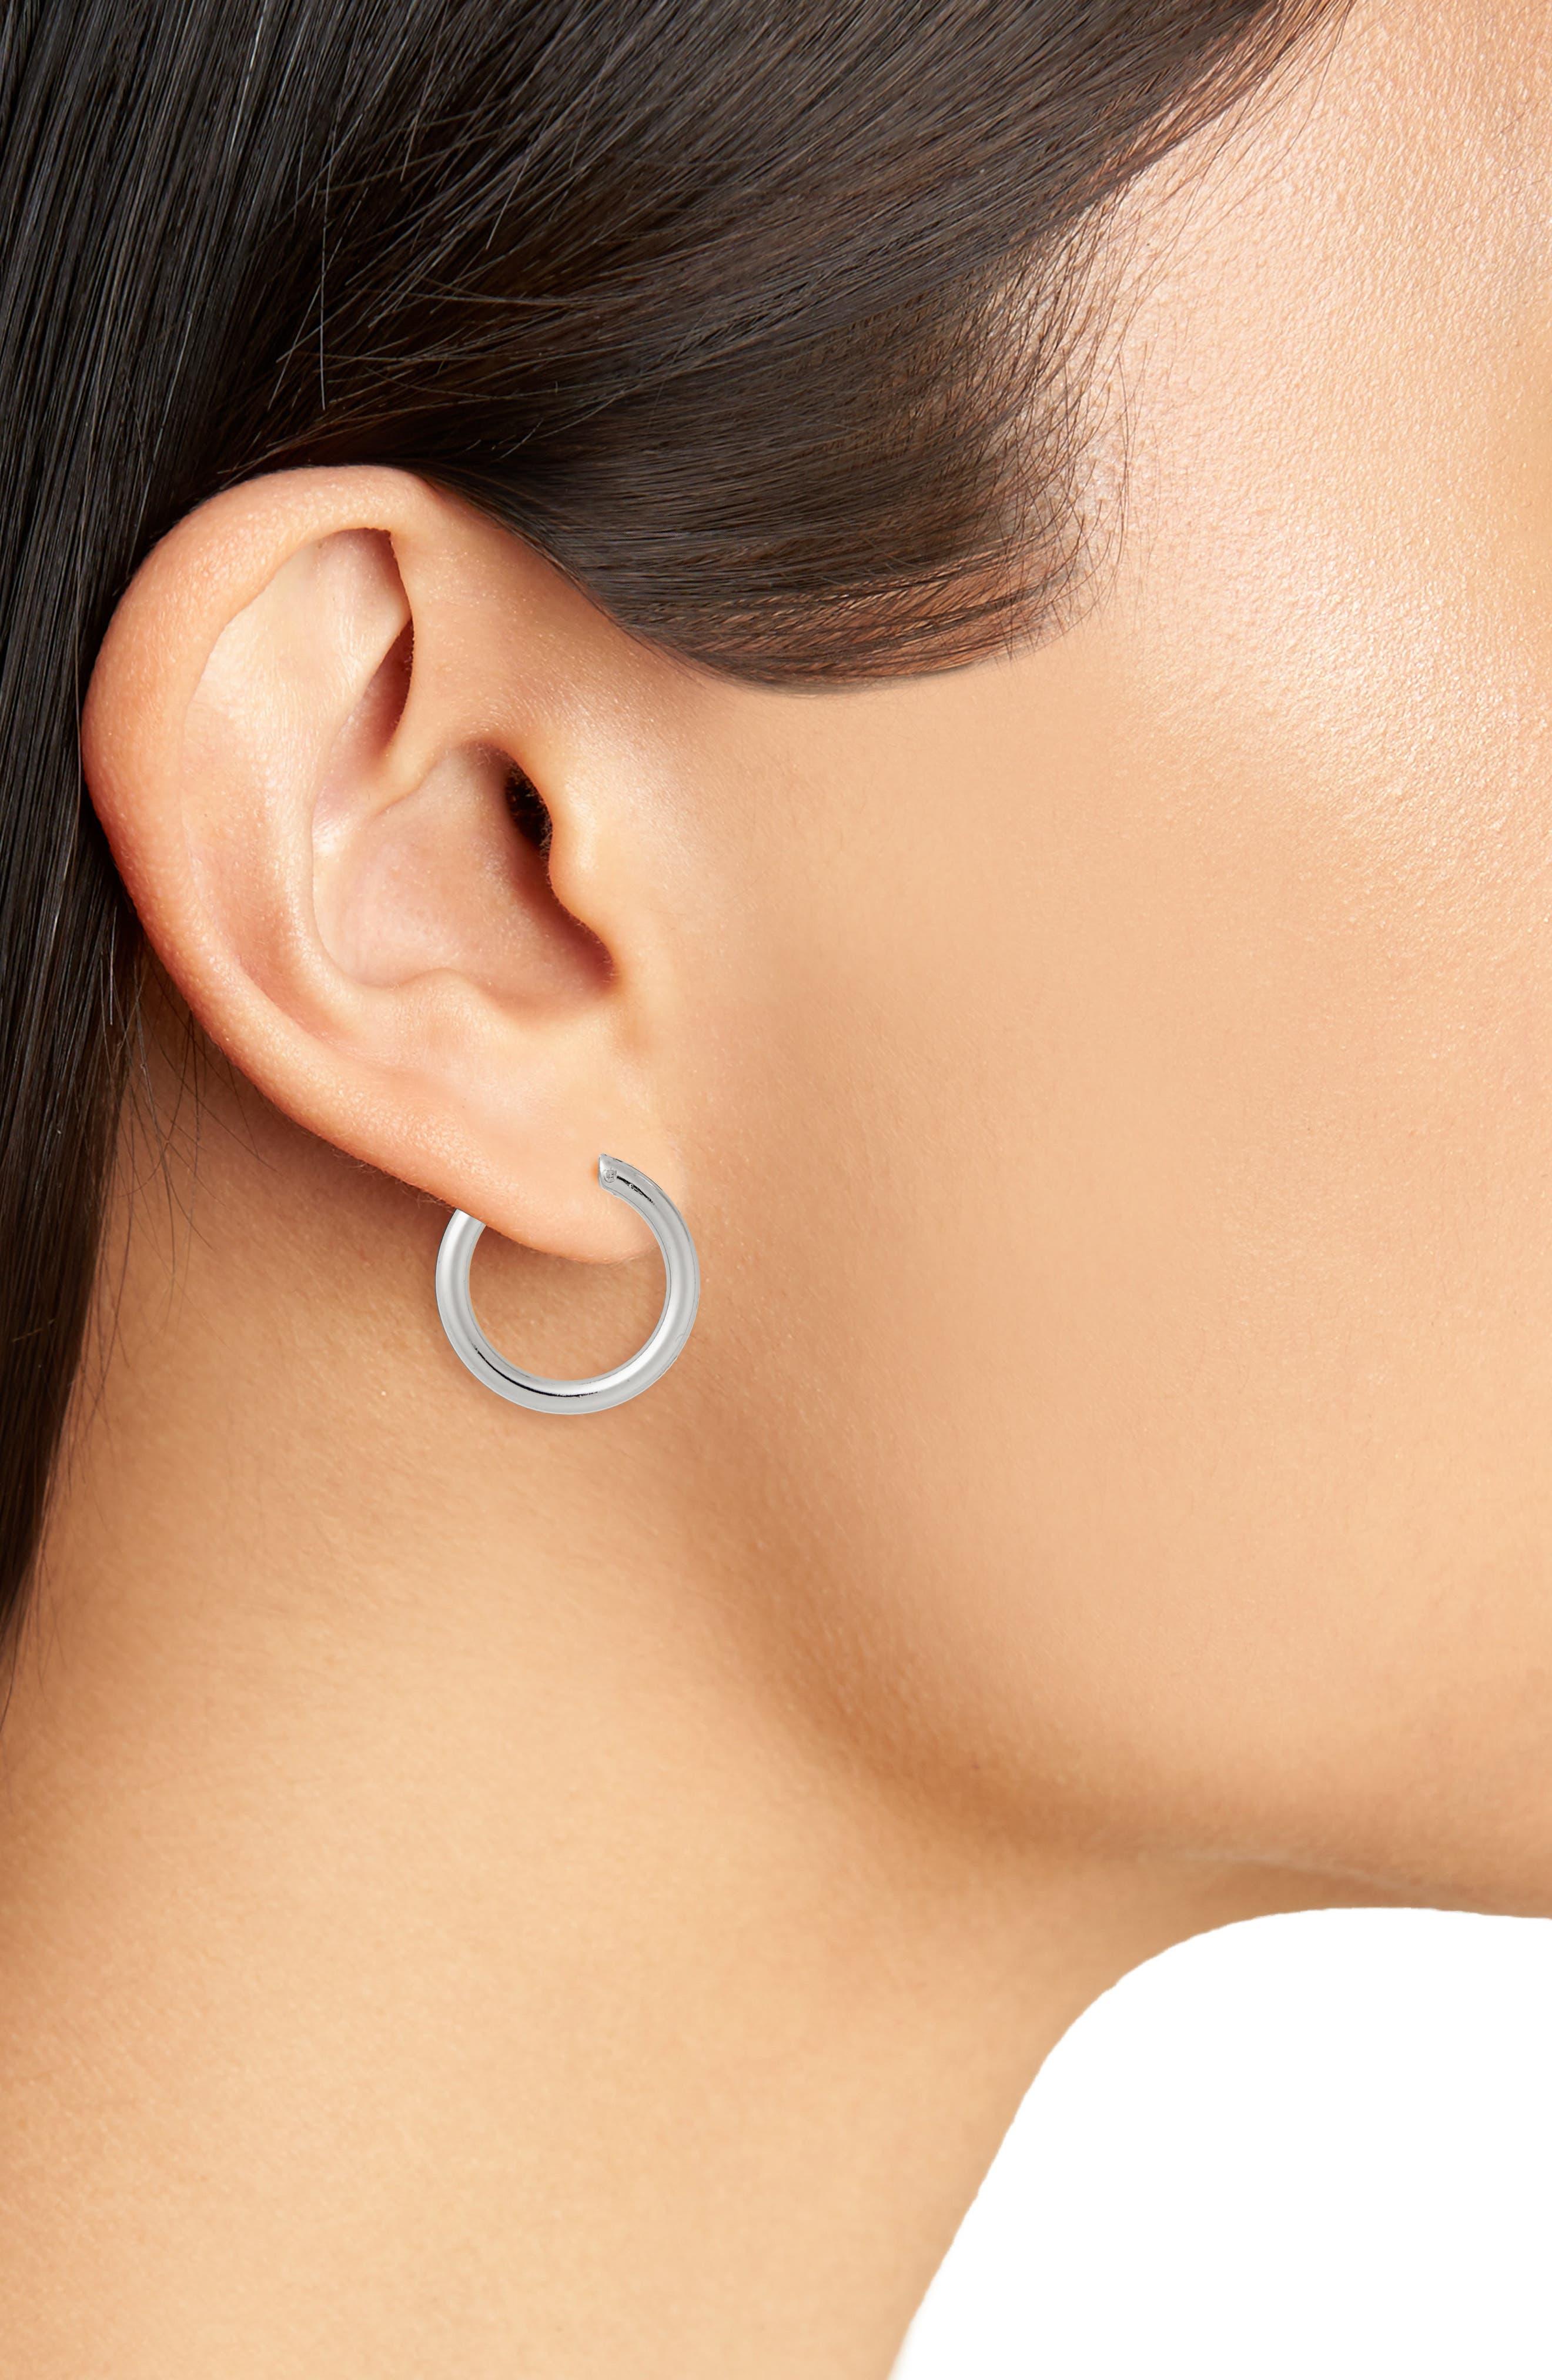 Small Endless Hoop Earrings,                             Alternate thumbnail 2, color,                             RHODIUM